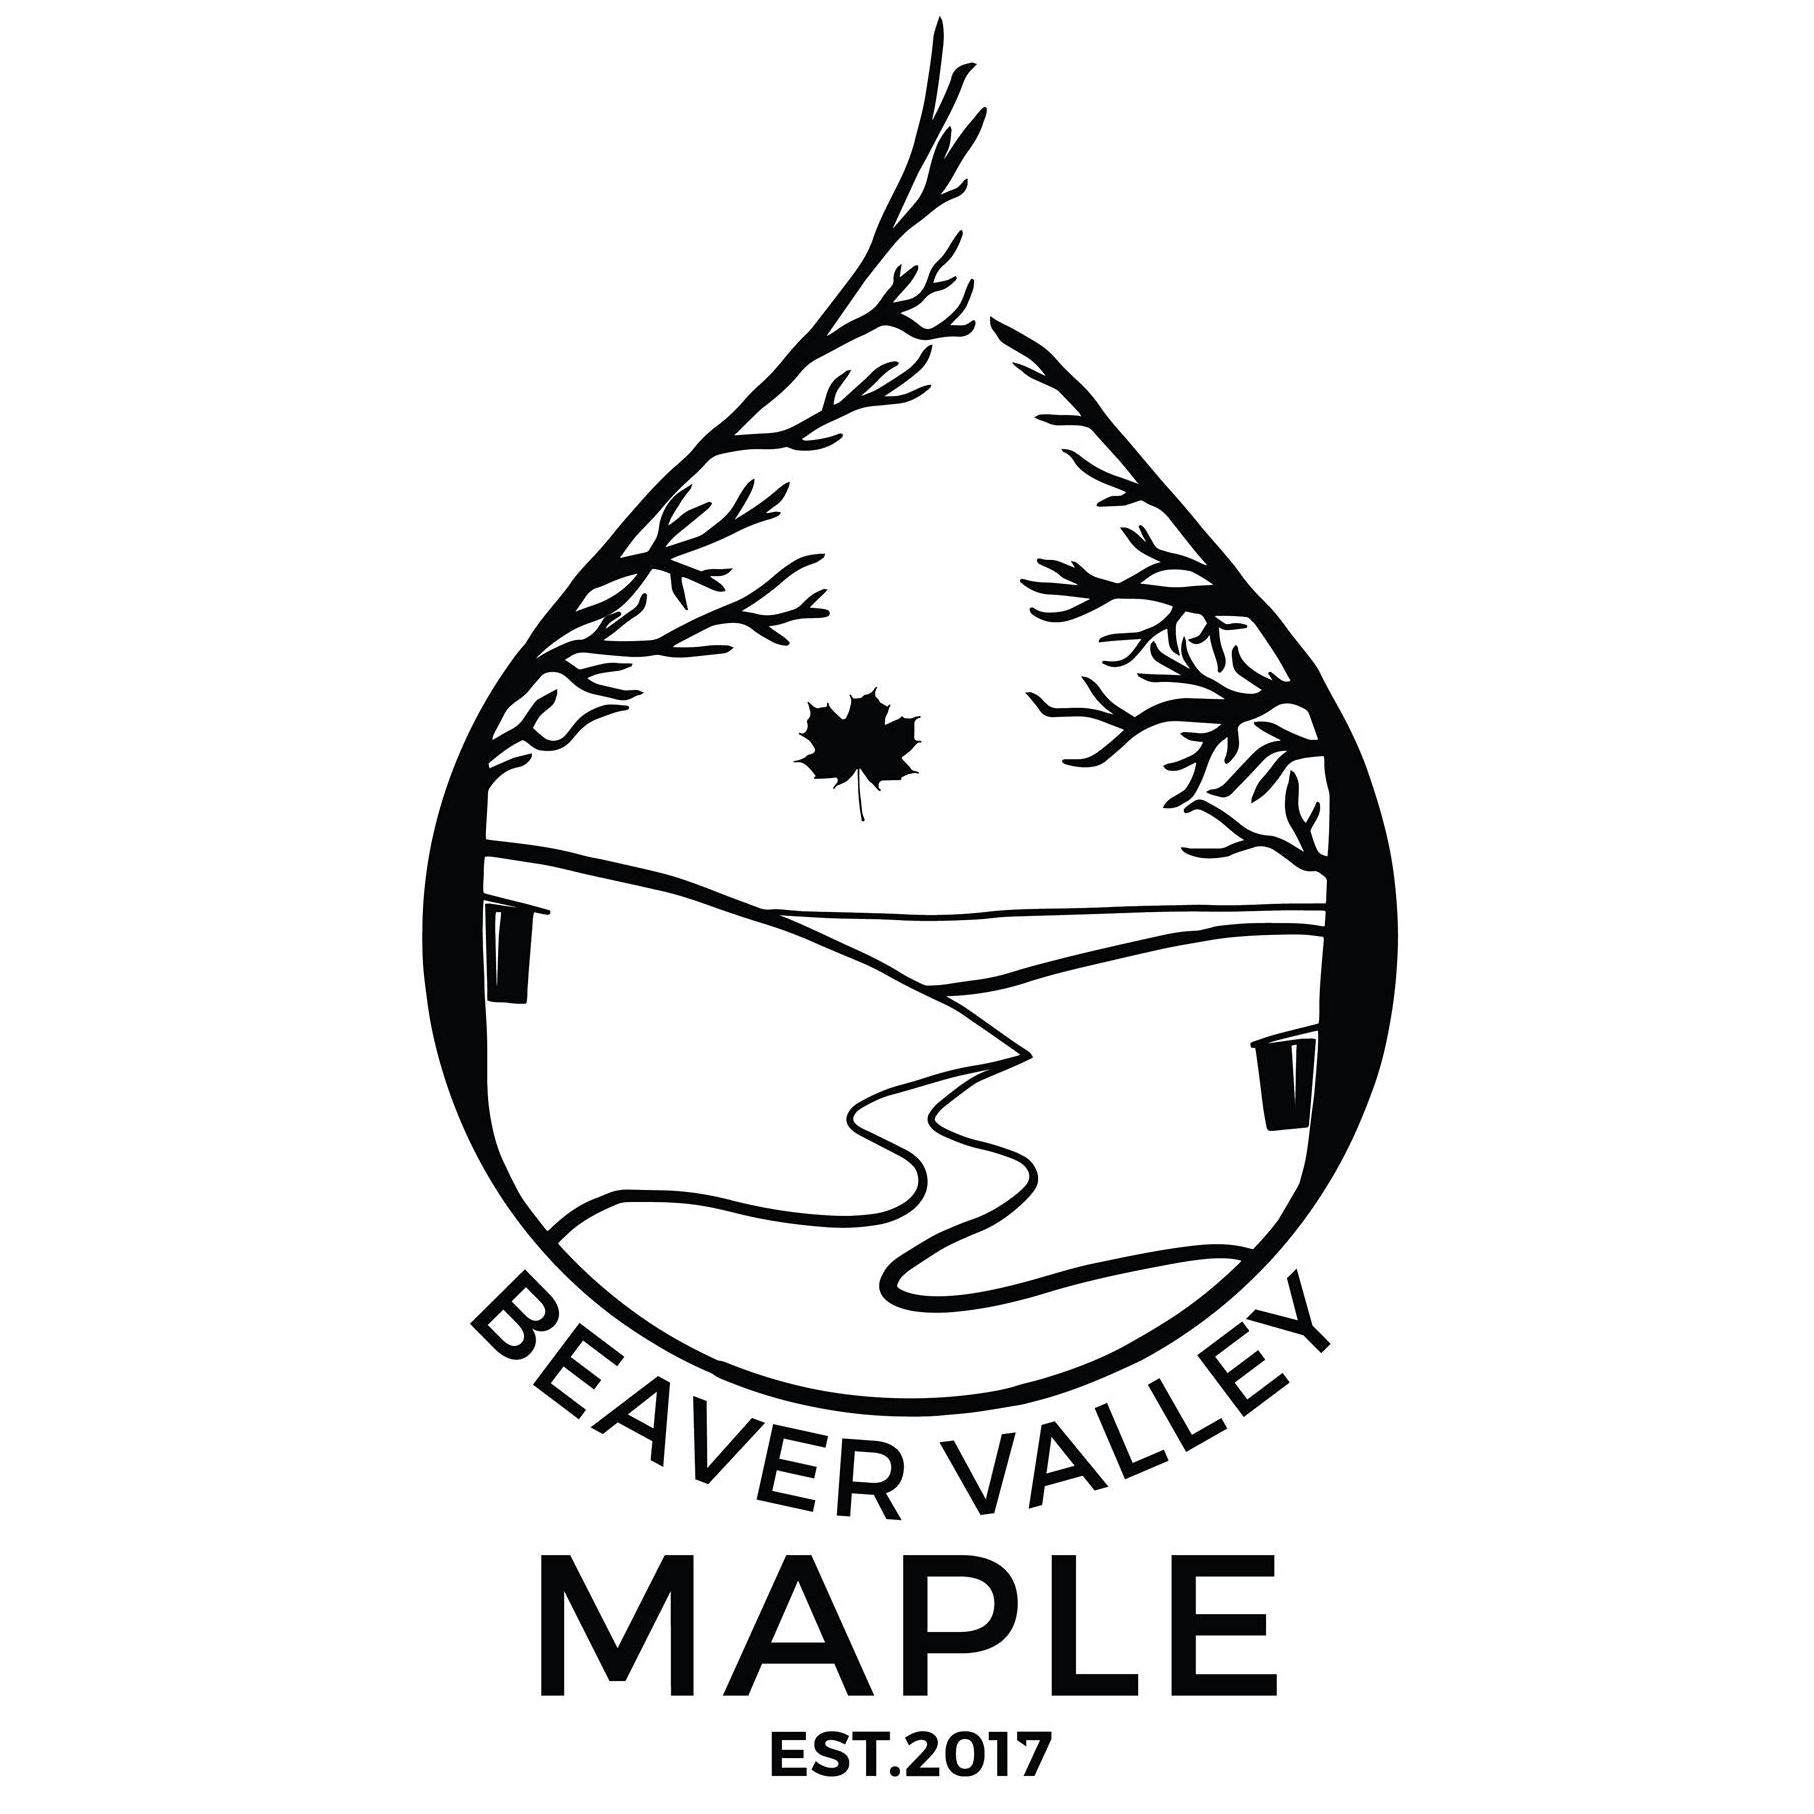 Beaver Valley Maple